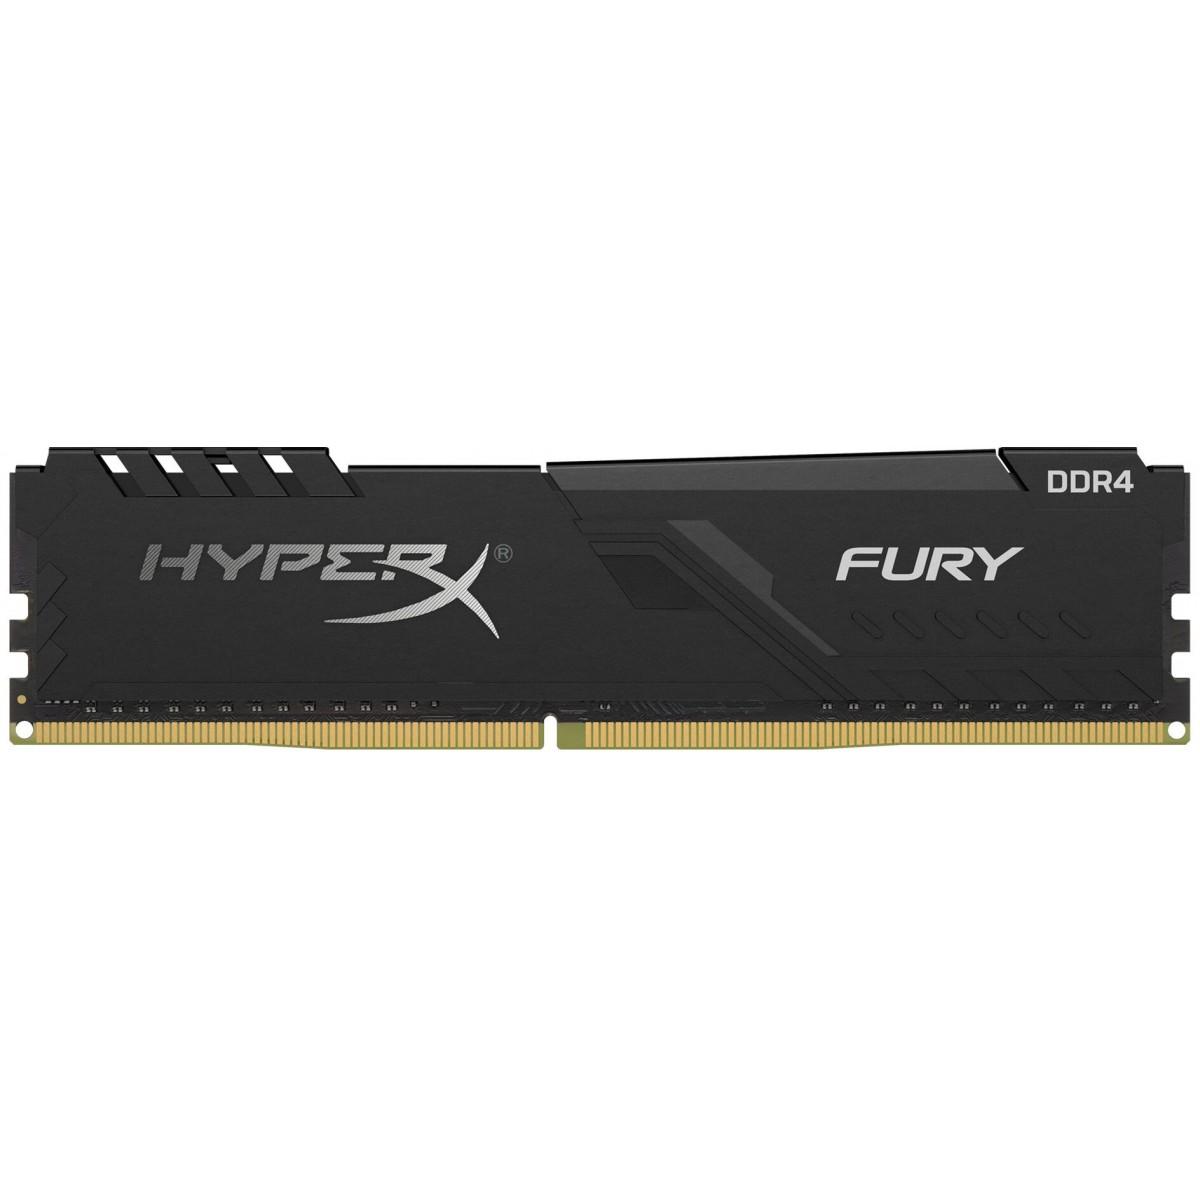 Memória DDR4 Kingston HyperX Fury, 4GB 3200MHz, Black, HX432C16FB3/4